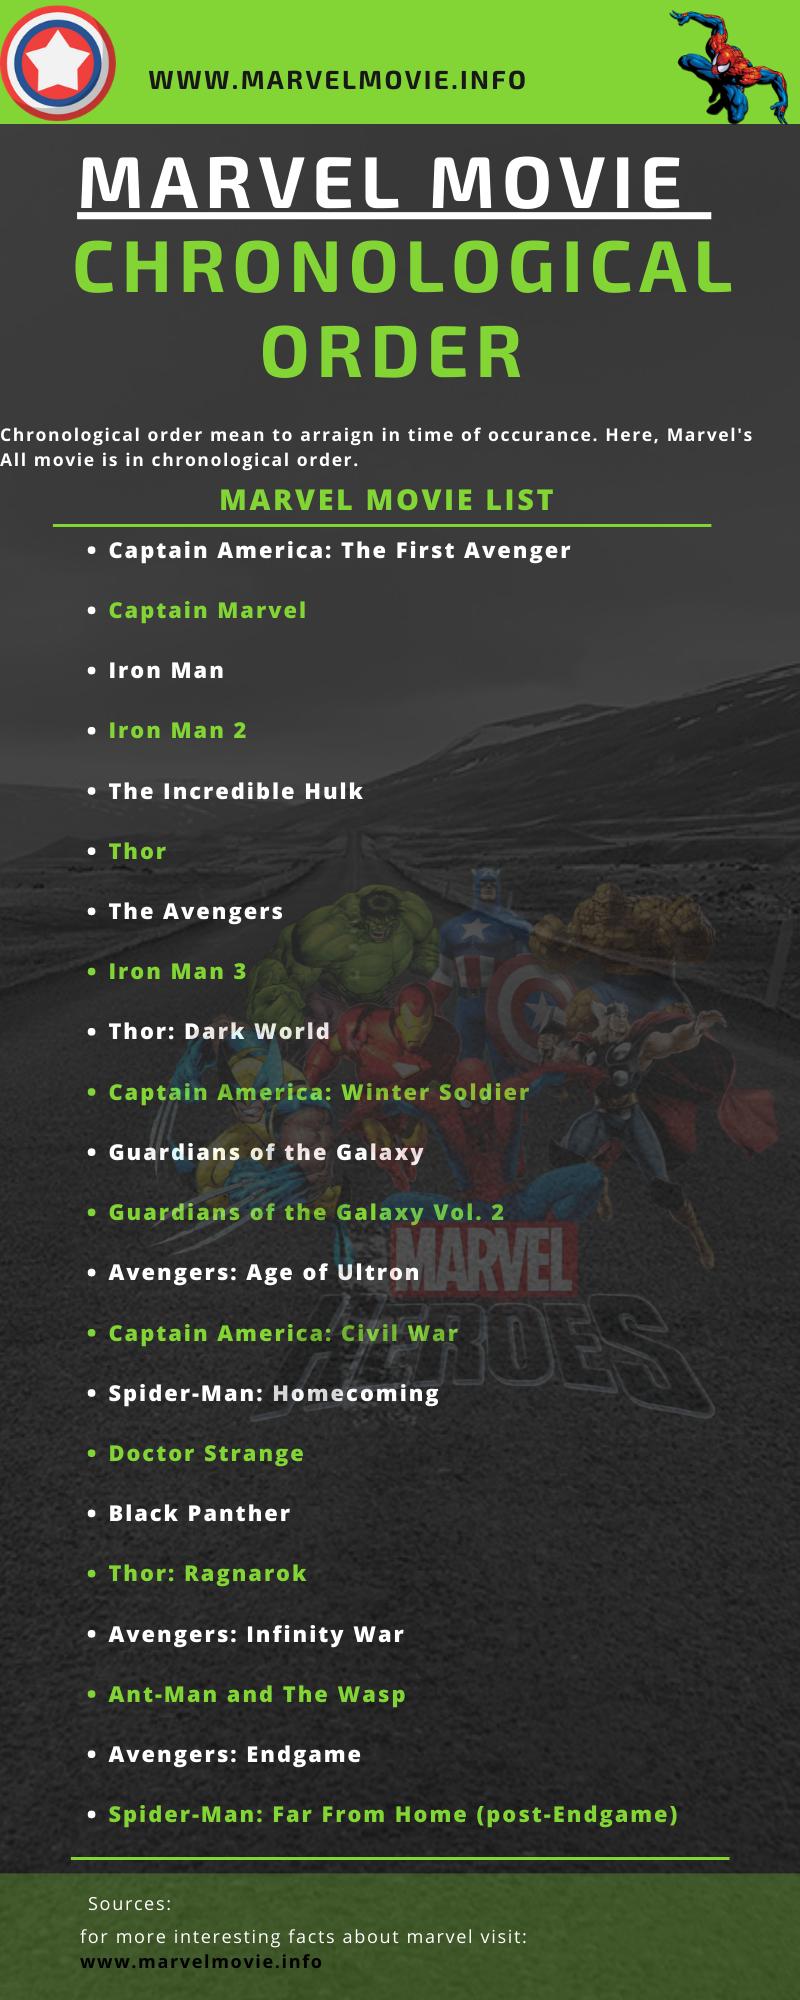 All Marvel films in chronological order Marvel movies